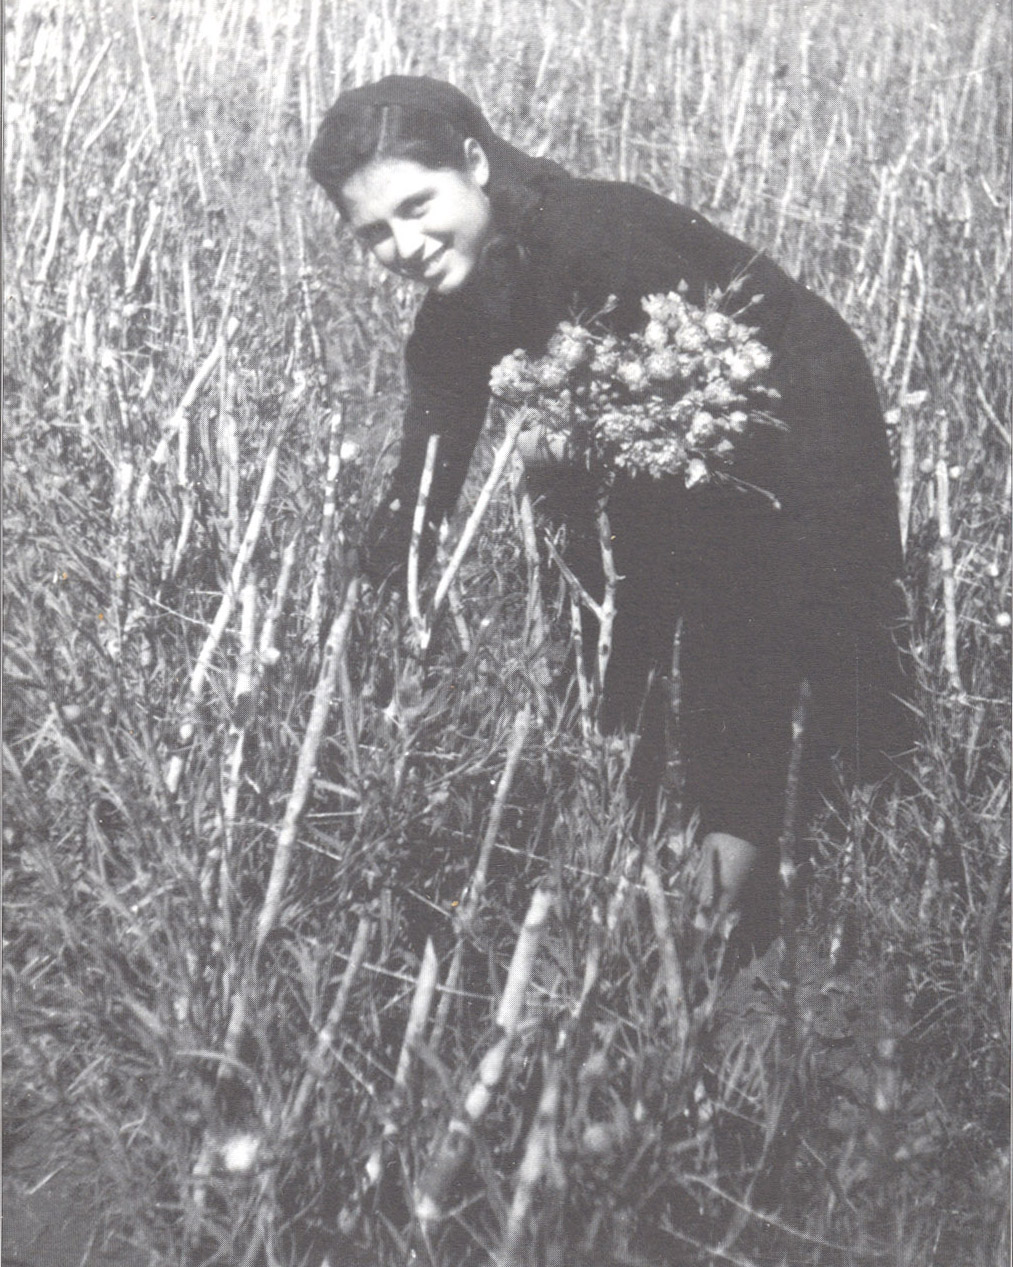 Teresa Cola mentre raccoglie i garofani